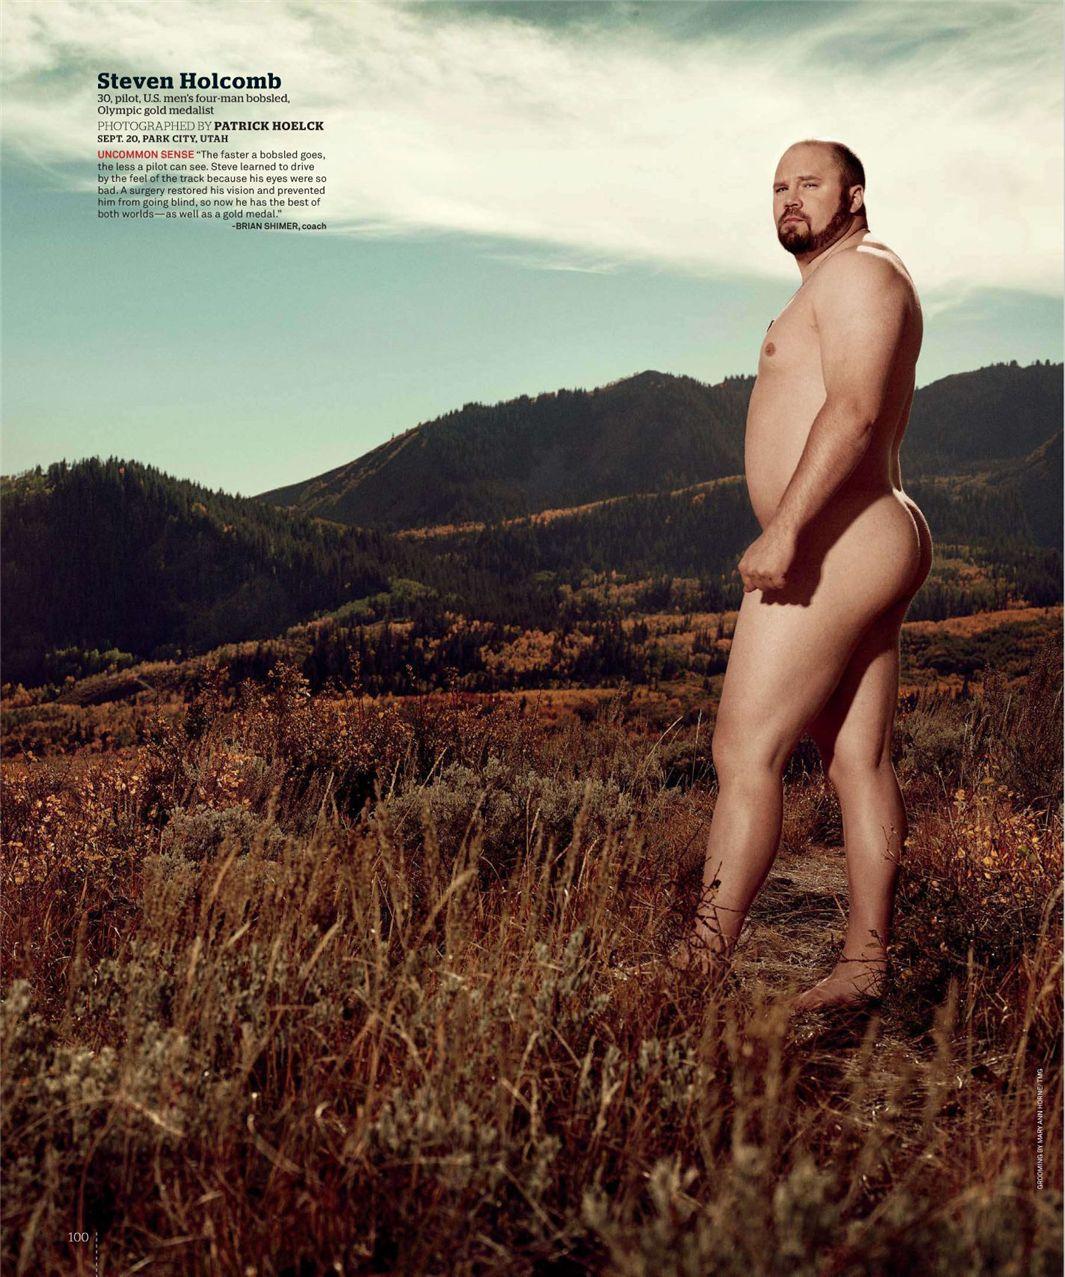 Стивен Холкомб / Steven Holcomb - ESPN Magazine Body Issue 18 october 2010